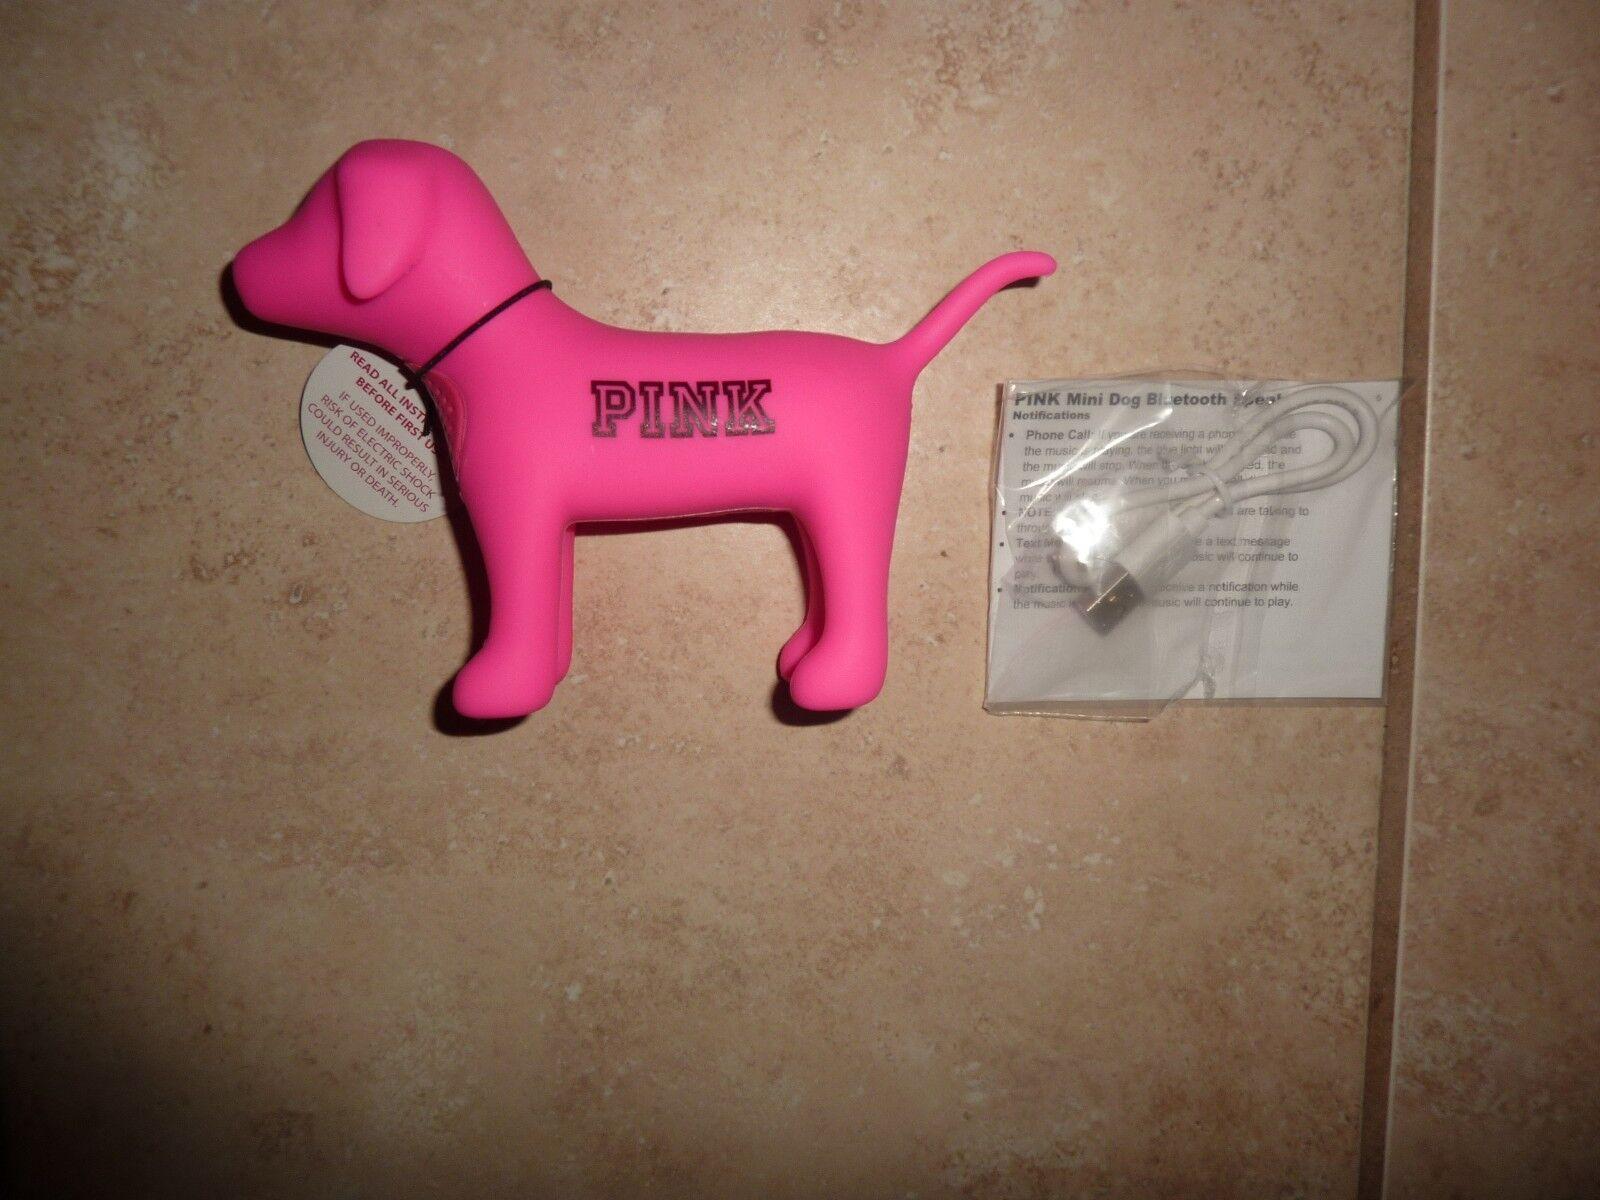 7ada06fab3 Victoria s Secret Pink Mini Dog Wireless Bluetooth Speaker for sale ...